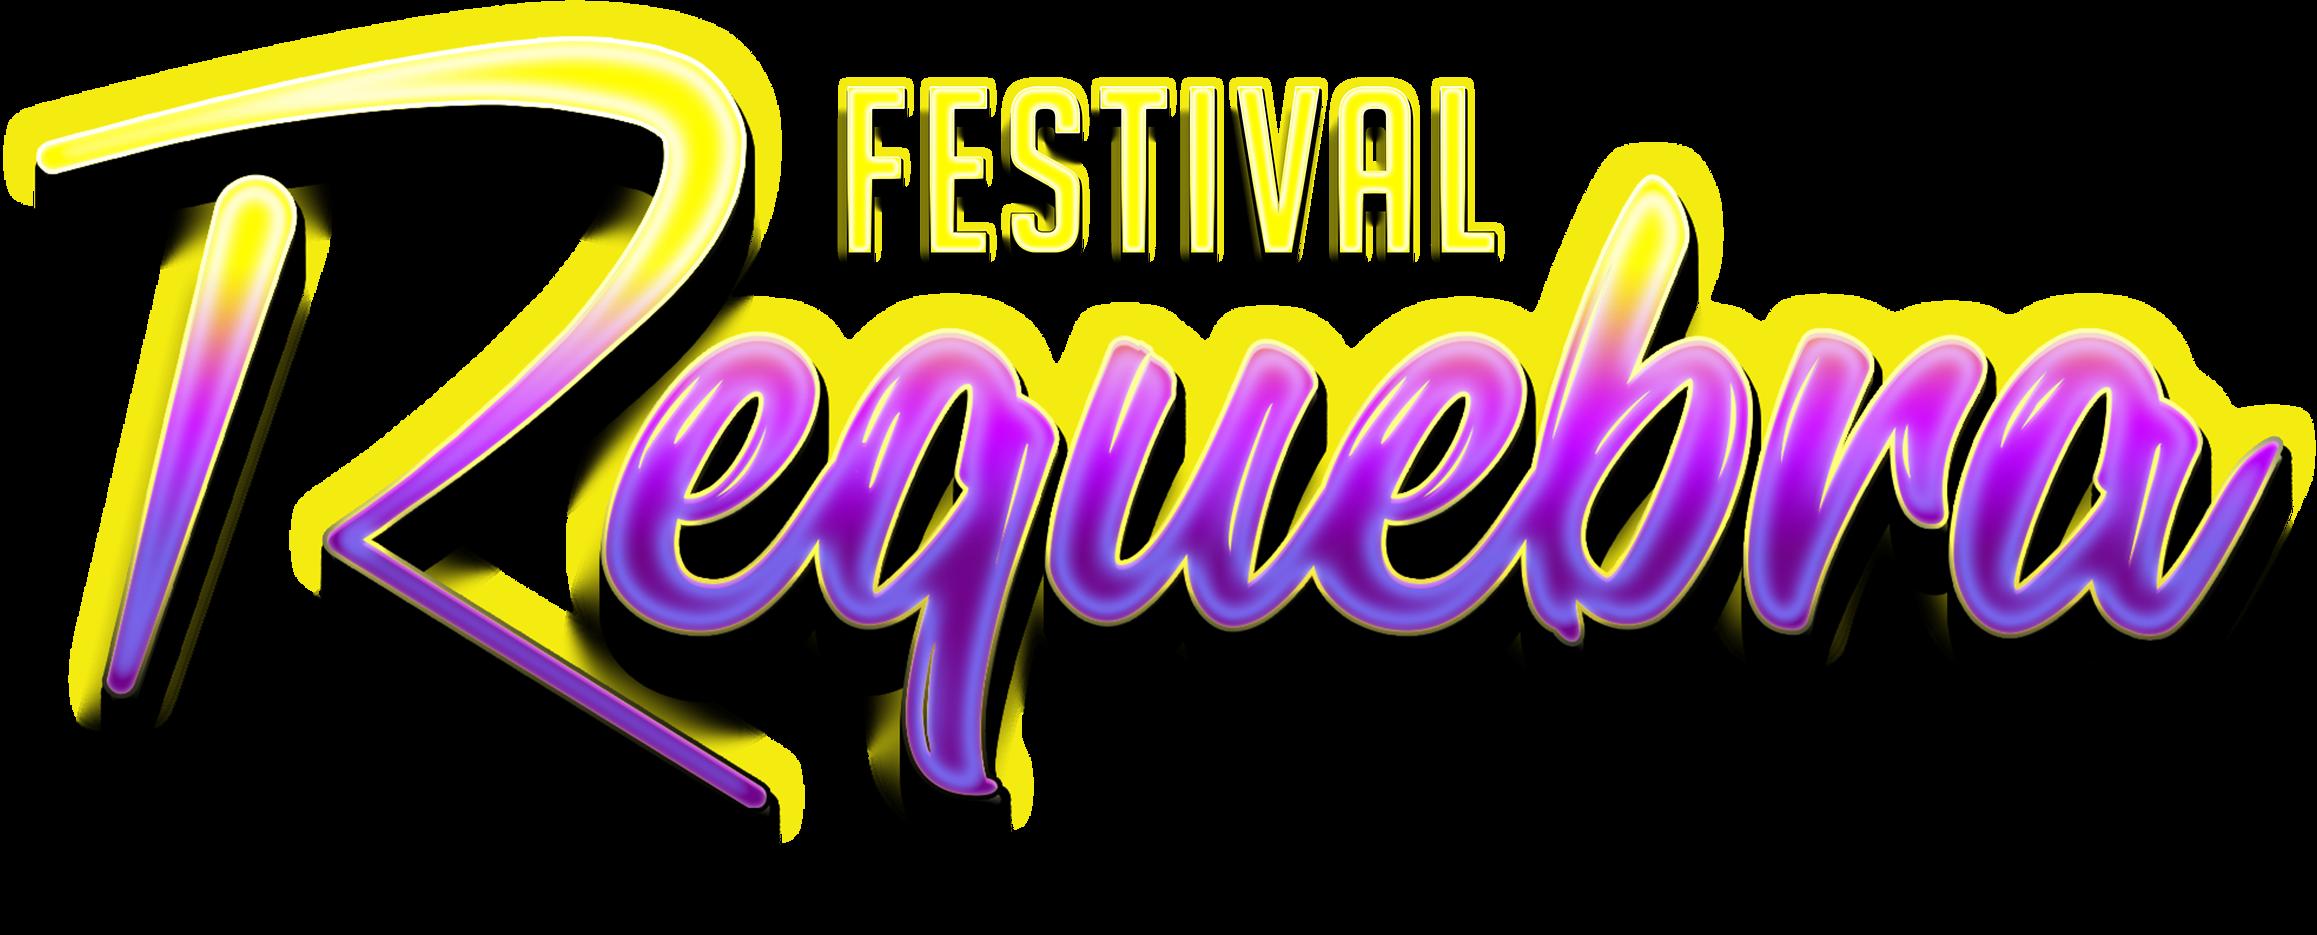 Festival Requebra